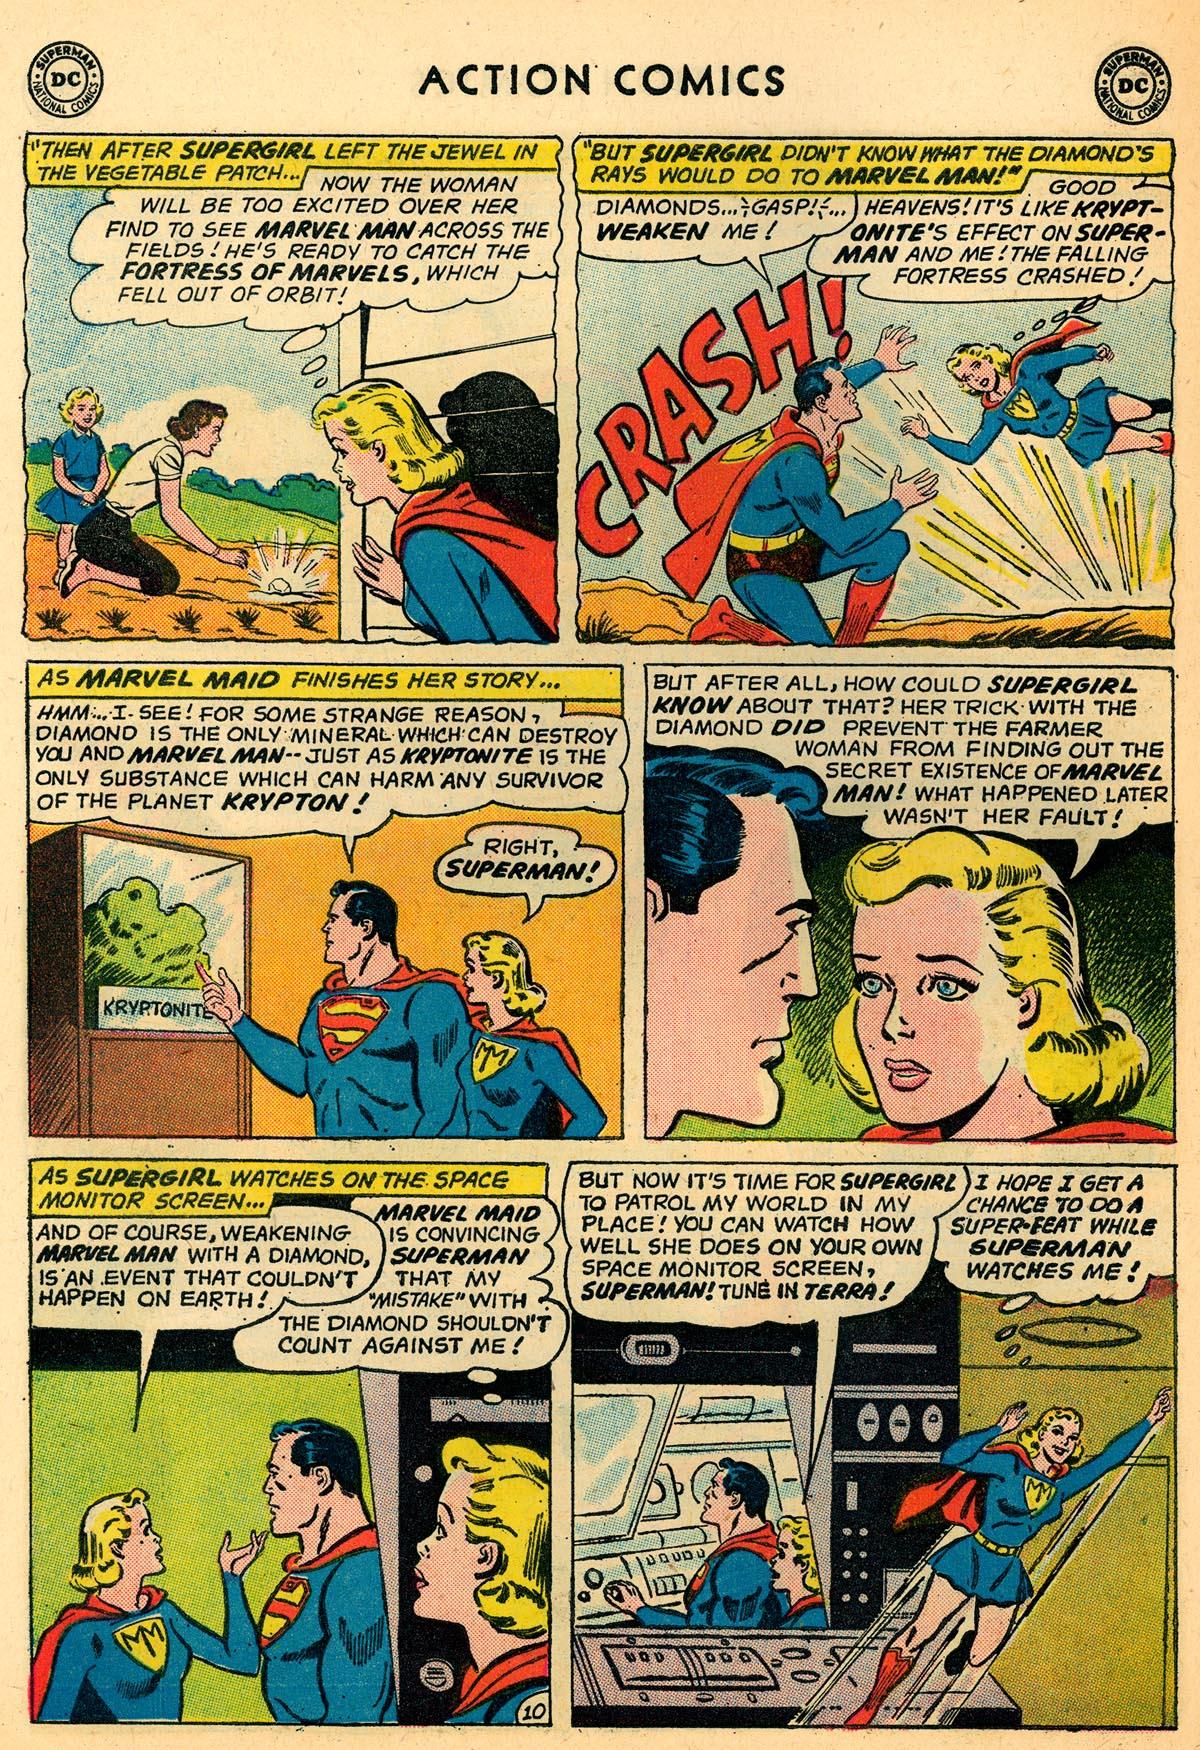 Action Comics (1938) 273 Page 25